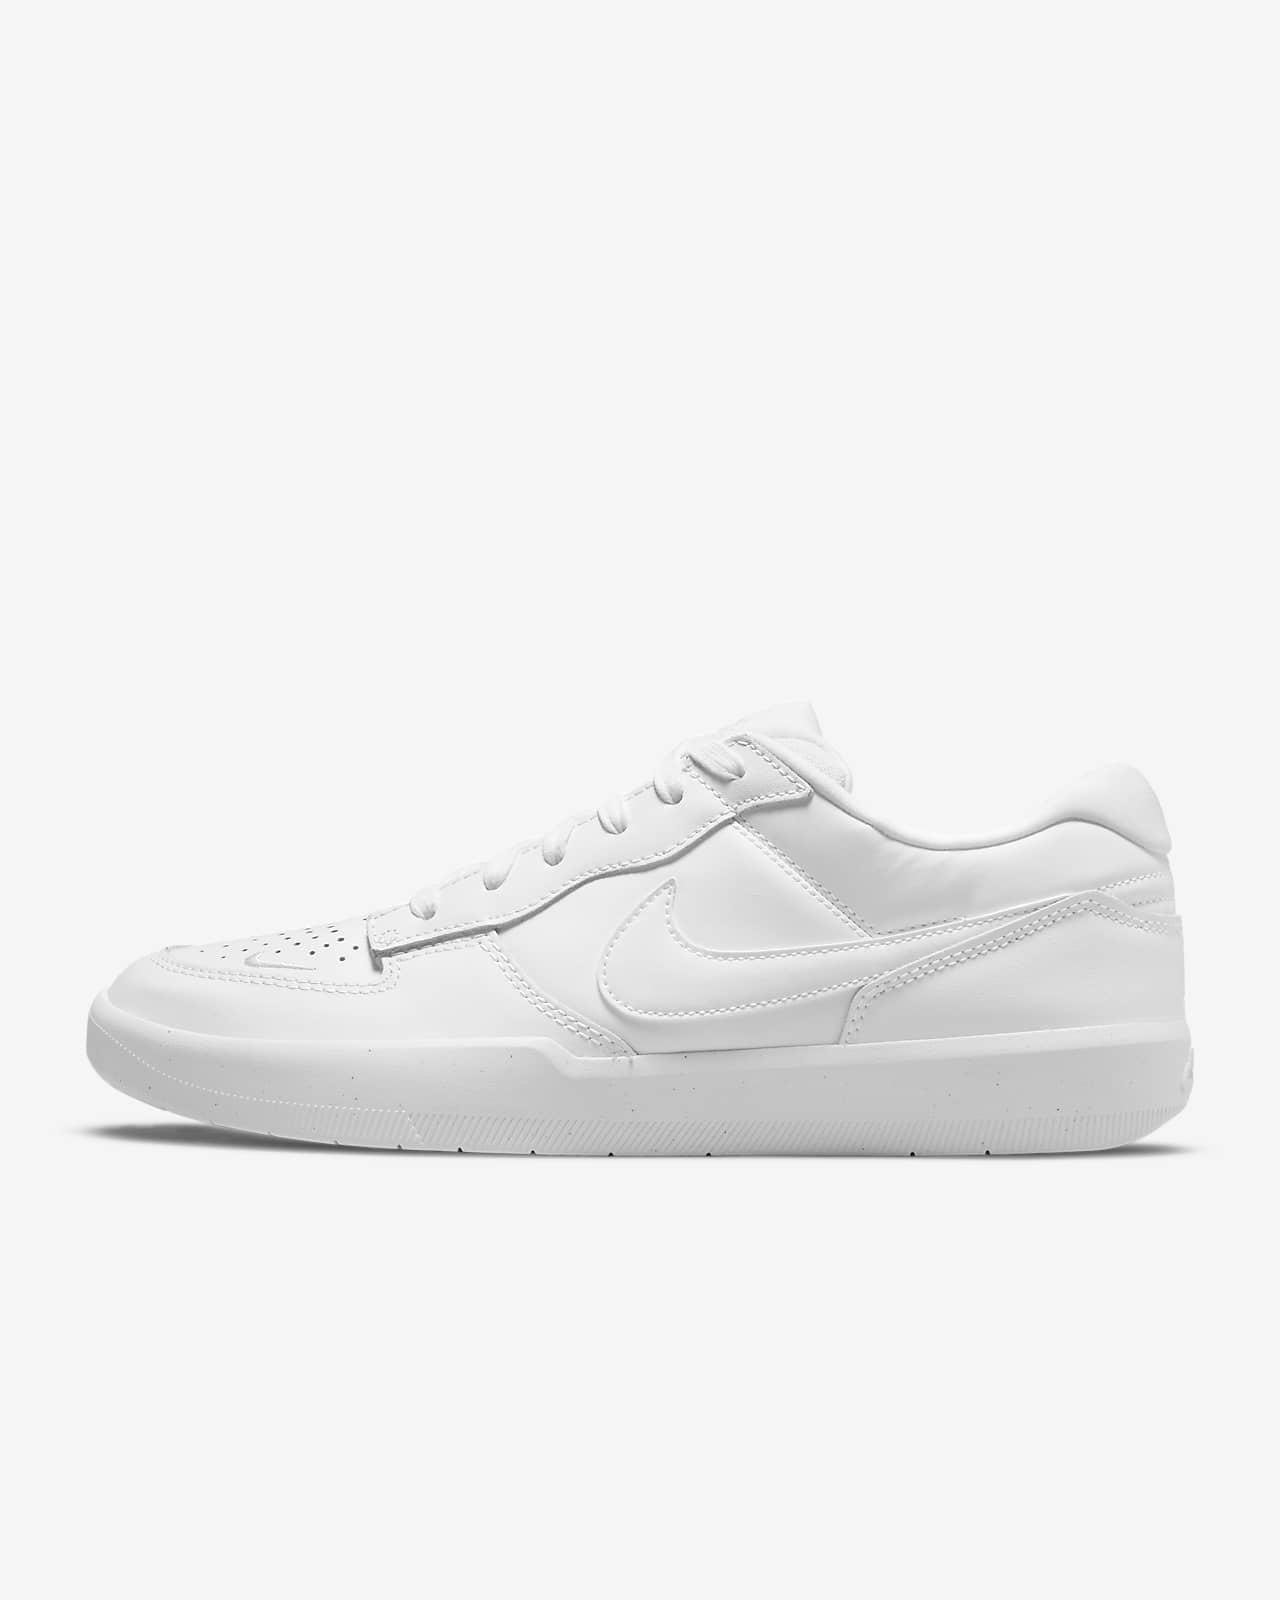 Nike SB Force 58 Premium Skate Shoe